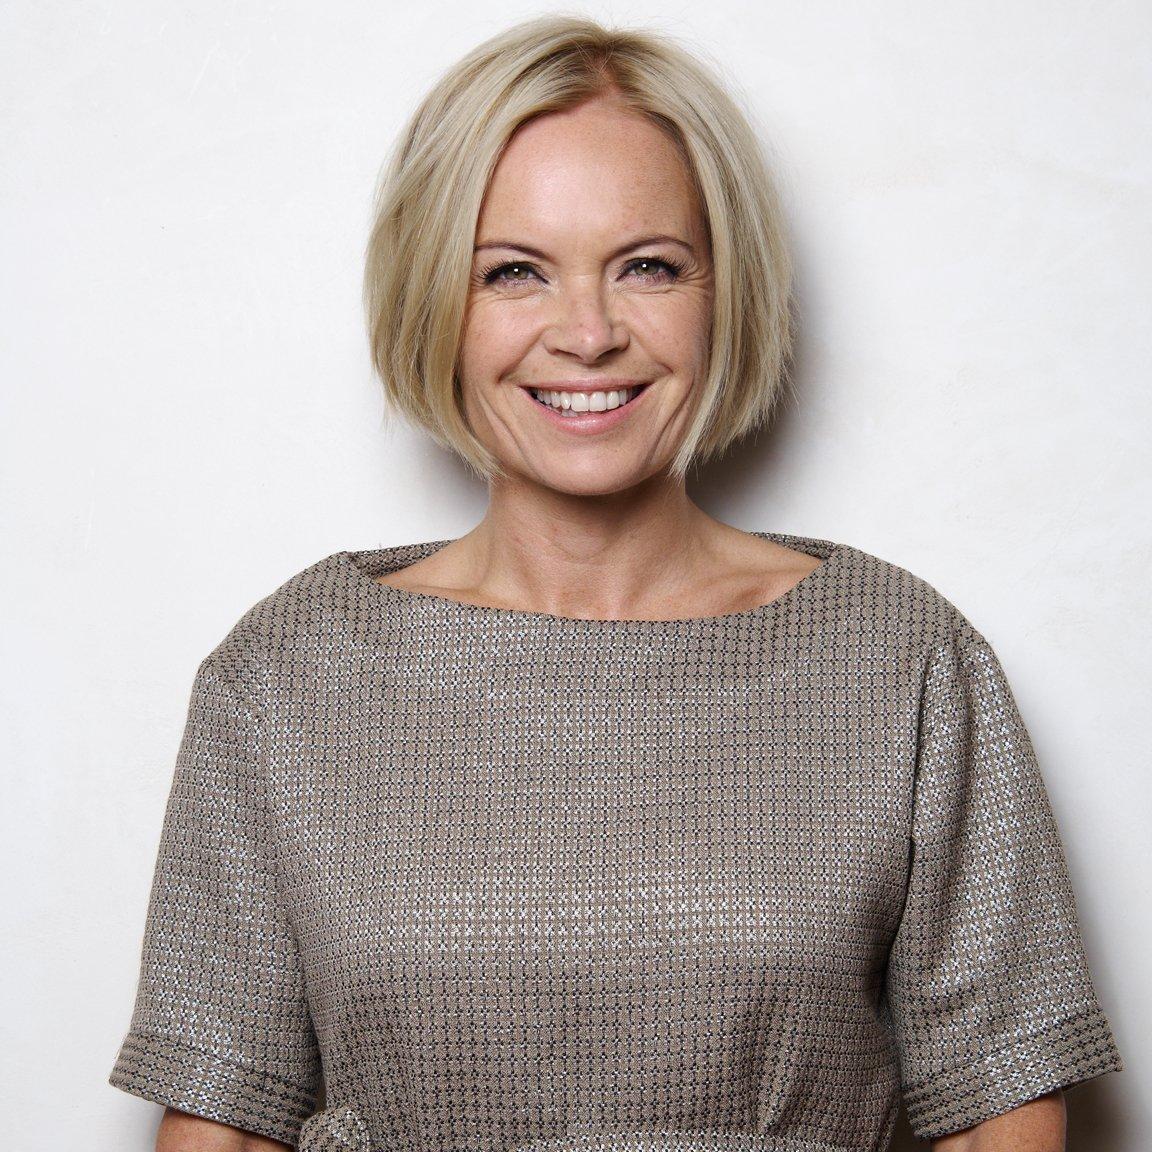 Angela Lemaltre